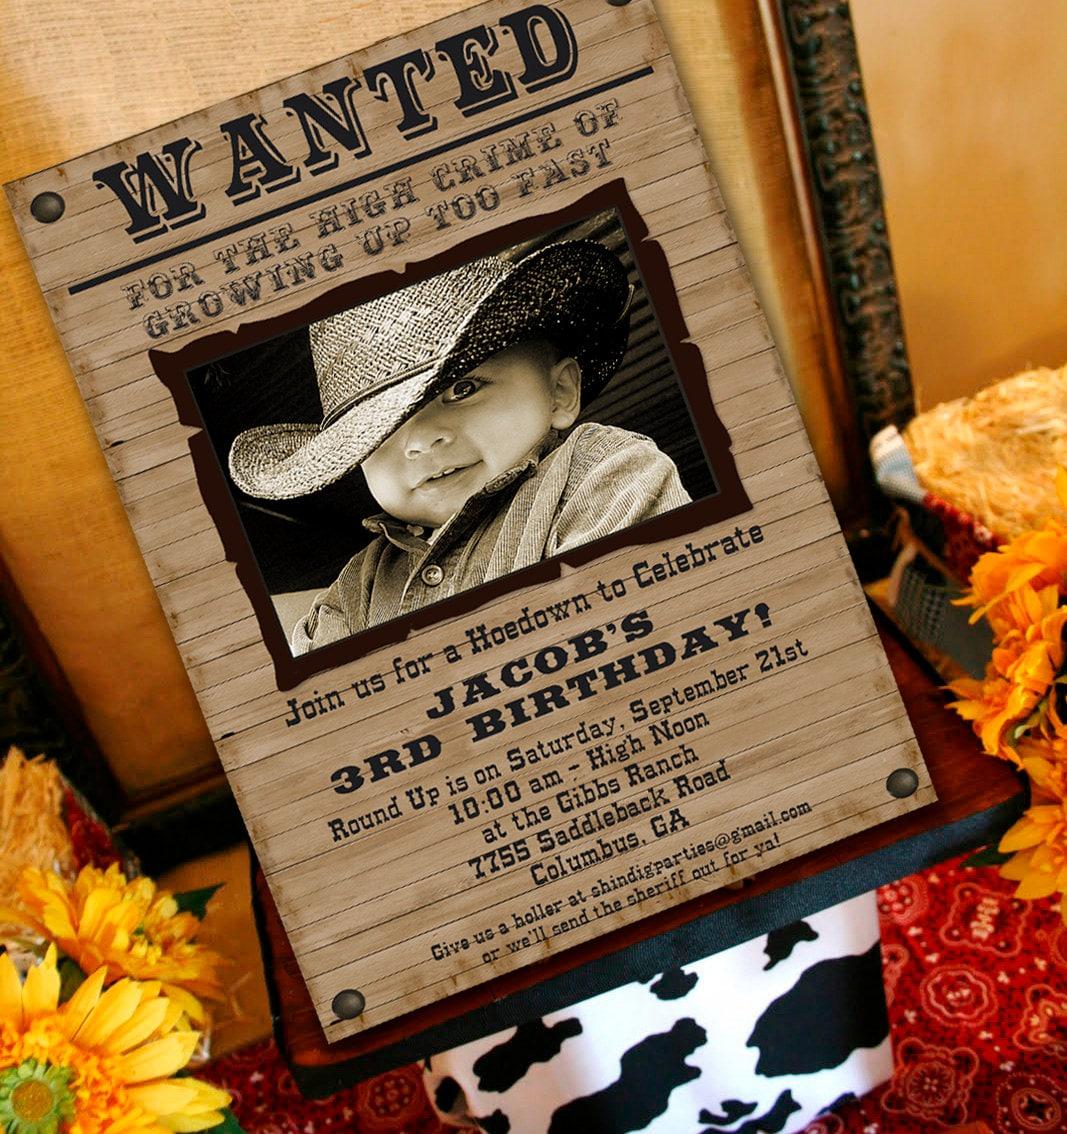 Cowboy Party Invites was perfect invitations design